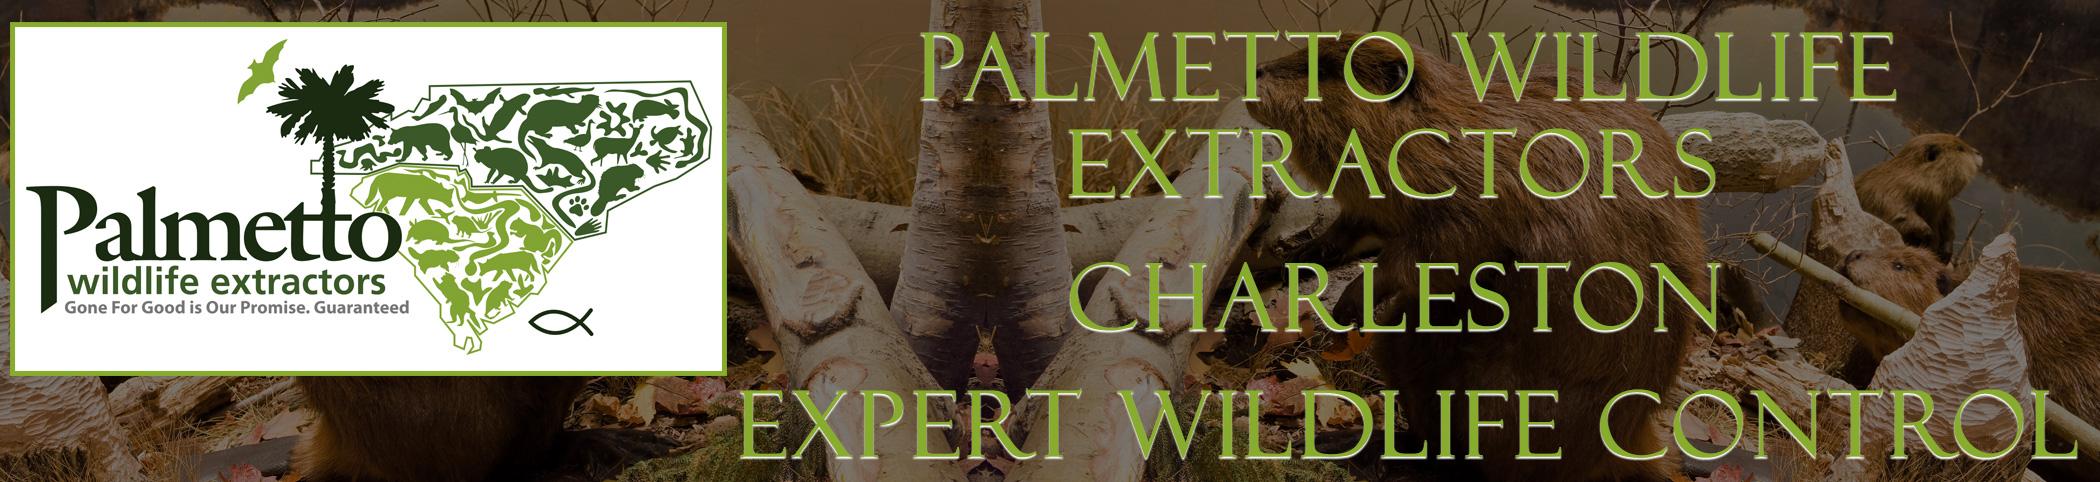 Palmetto Wildlife Extractors Charleston south carolina header image